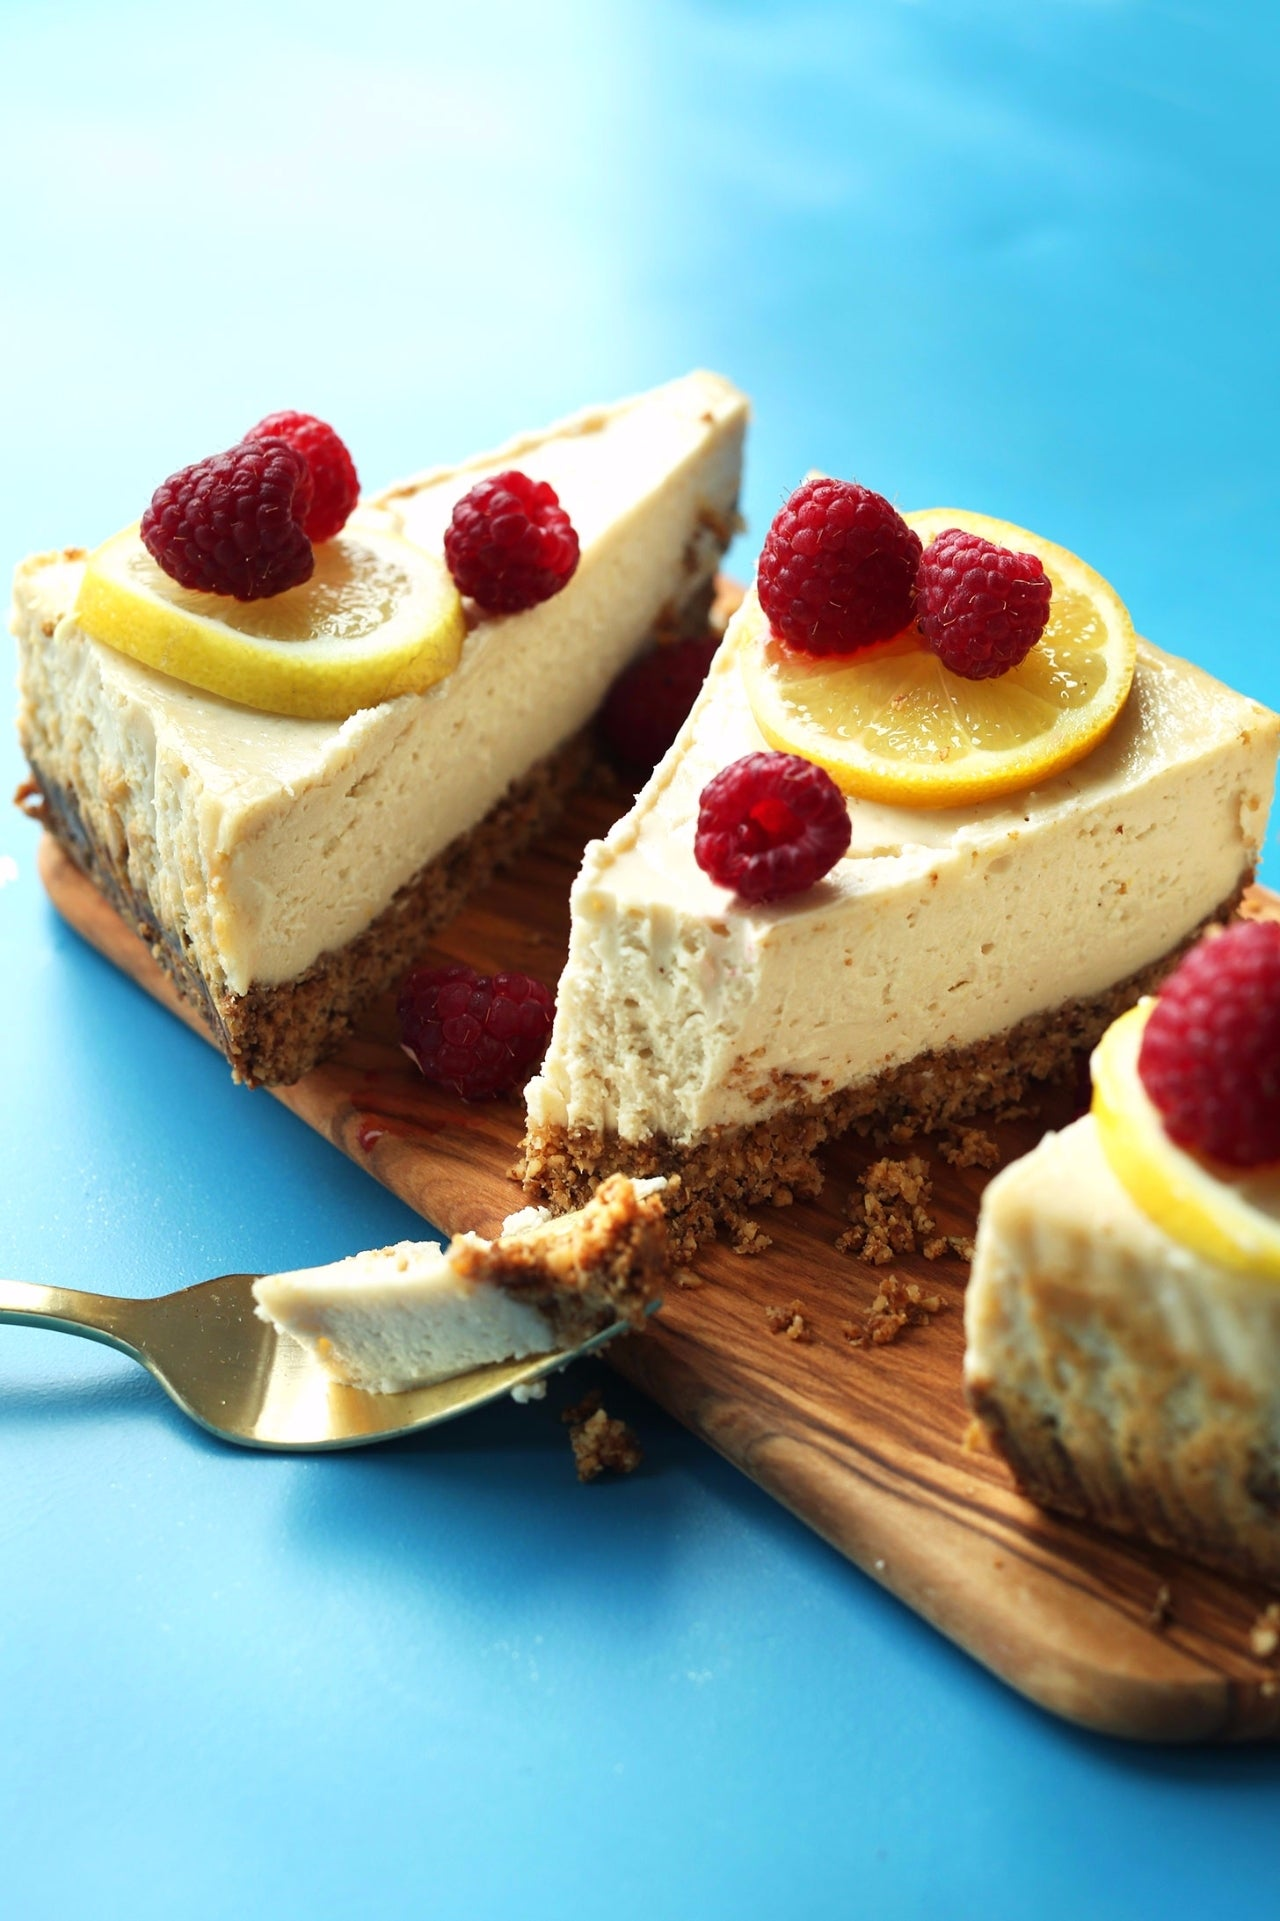 THE-BEST-BAKED-VEGAN-GLUTENFREE-Cheesecake-Made-in-entirely-in-the-blender-cheesecake-dessert-recipe